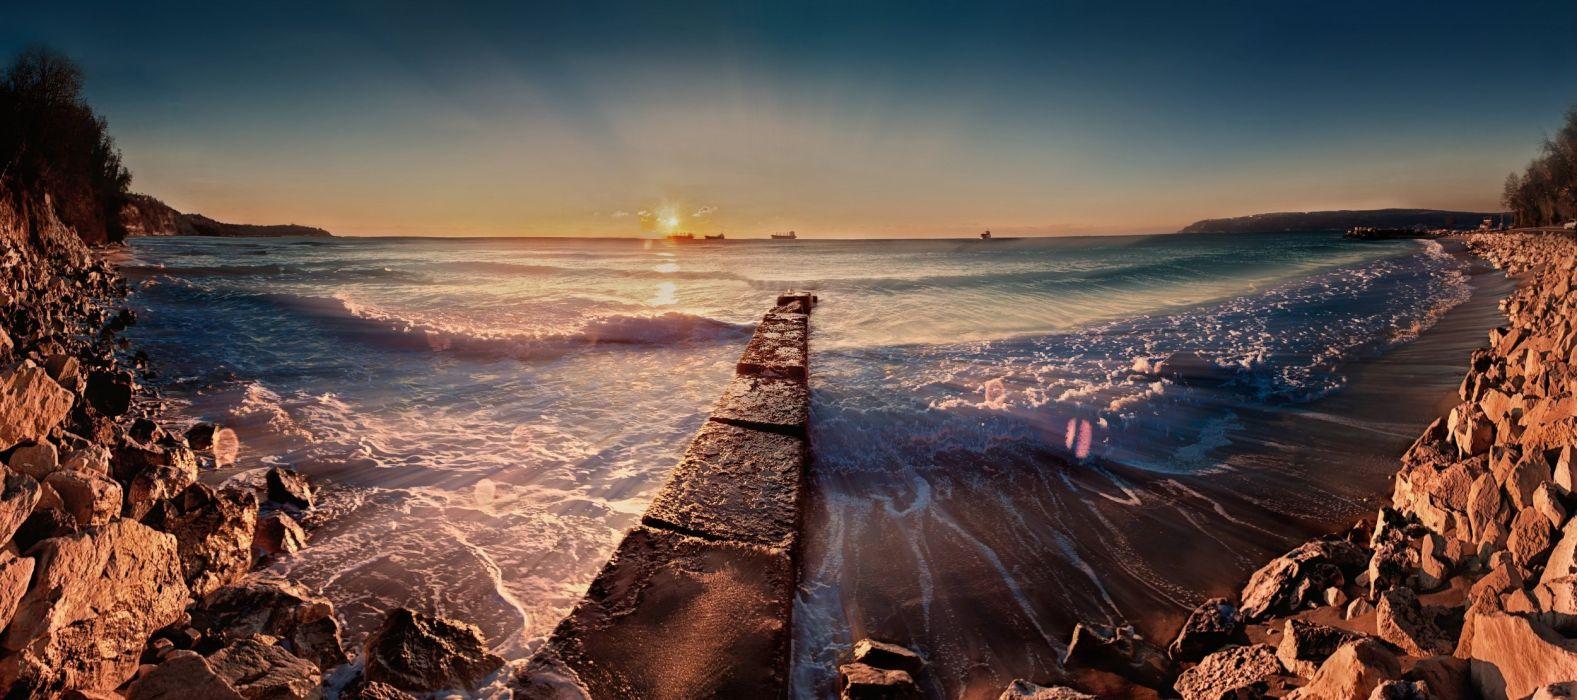 morning surf bulgaria coast sea stones wallpaper